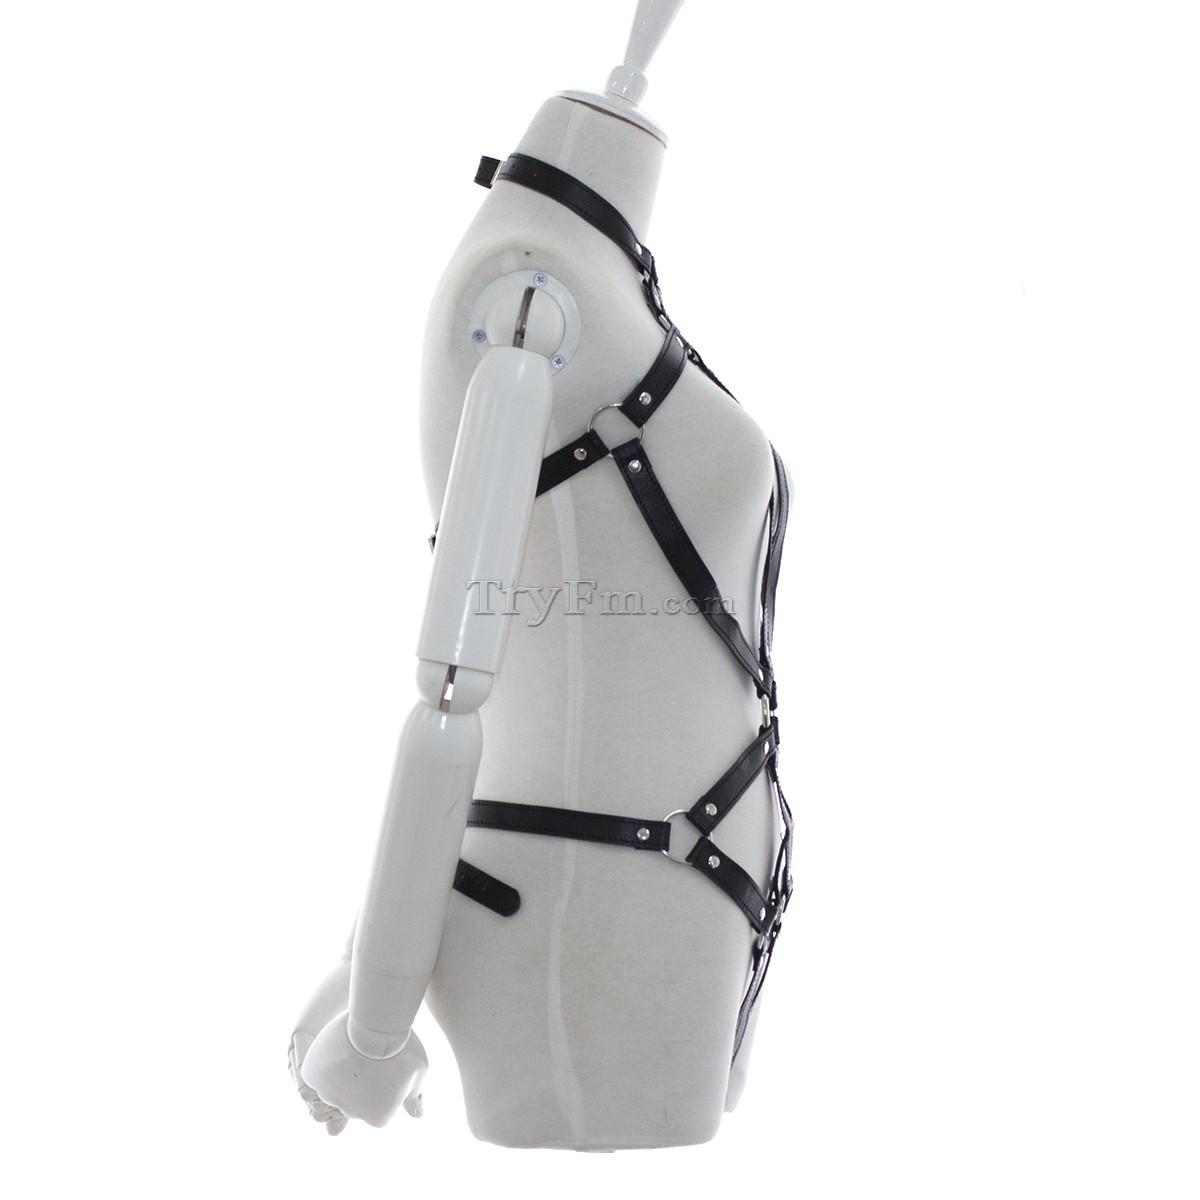 4-Leather-strap-rider-8.jpg